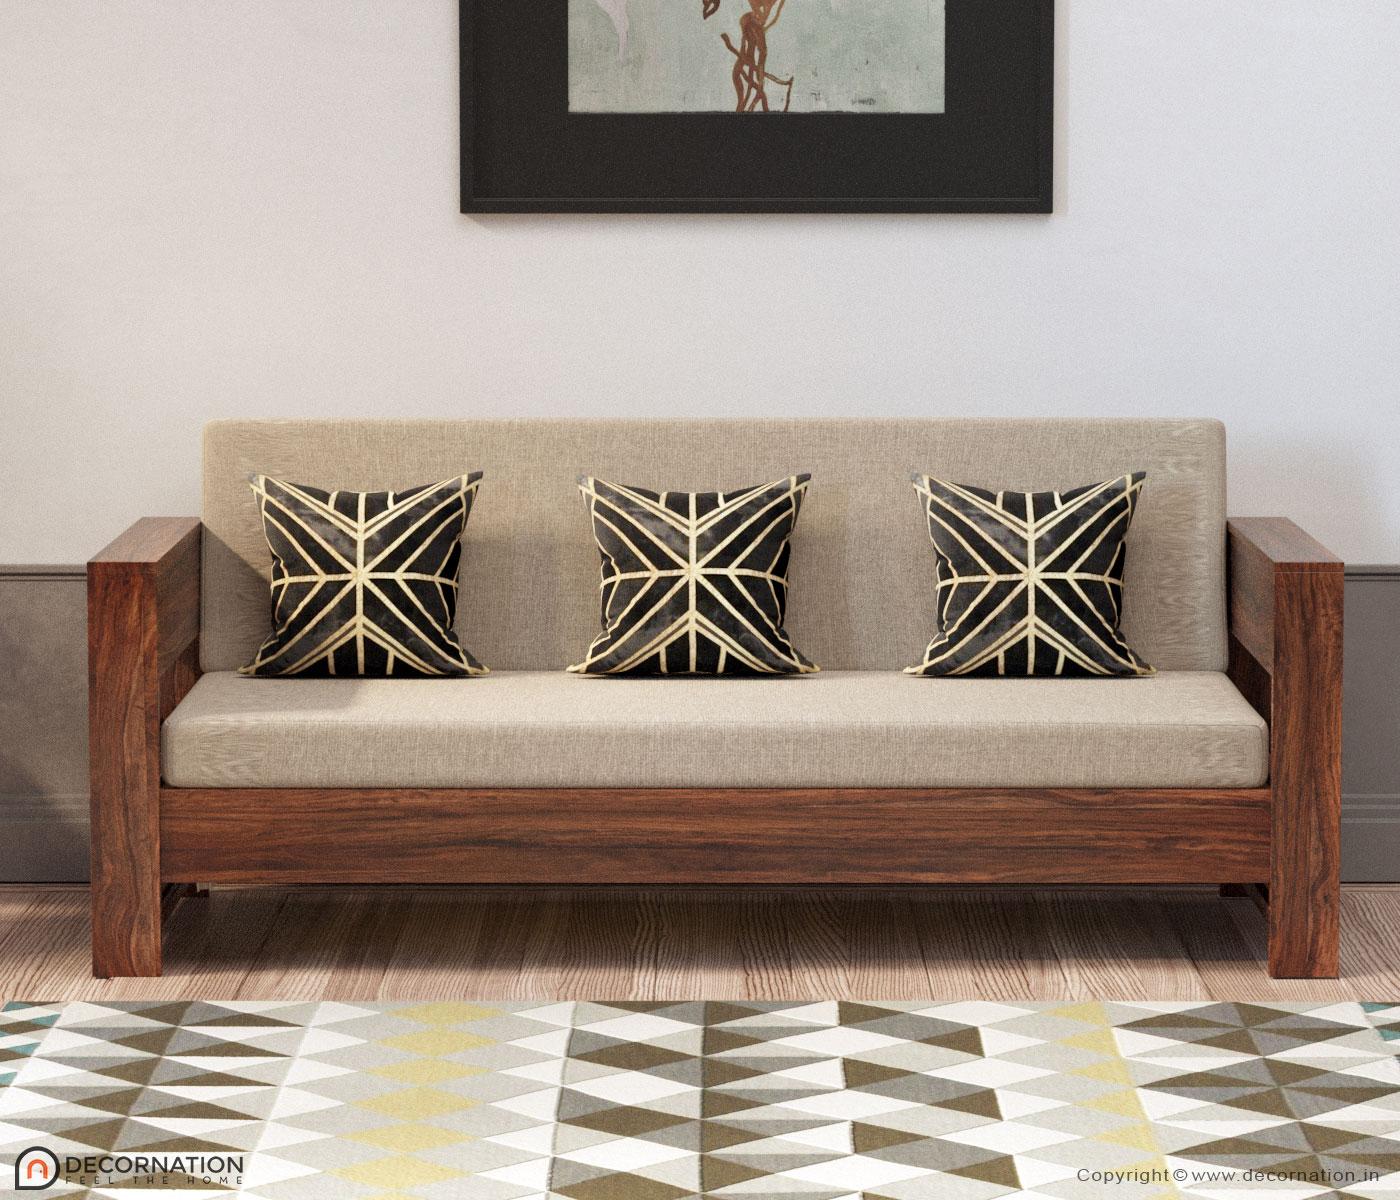 Lilian Solid Wood 5 Seater Livingroom Sofa Set - Decornation